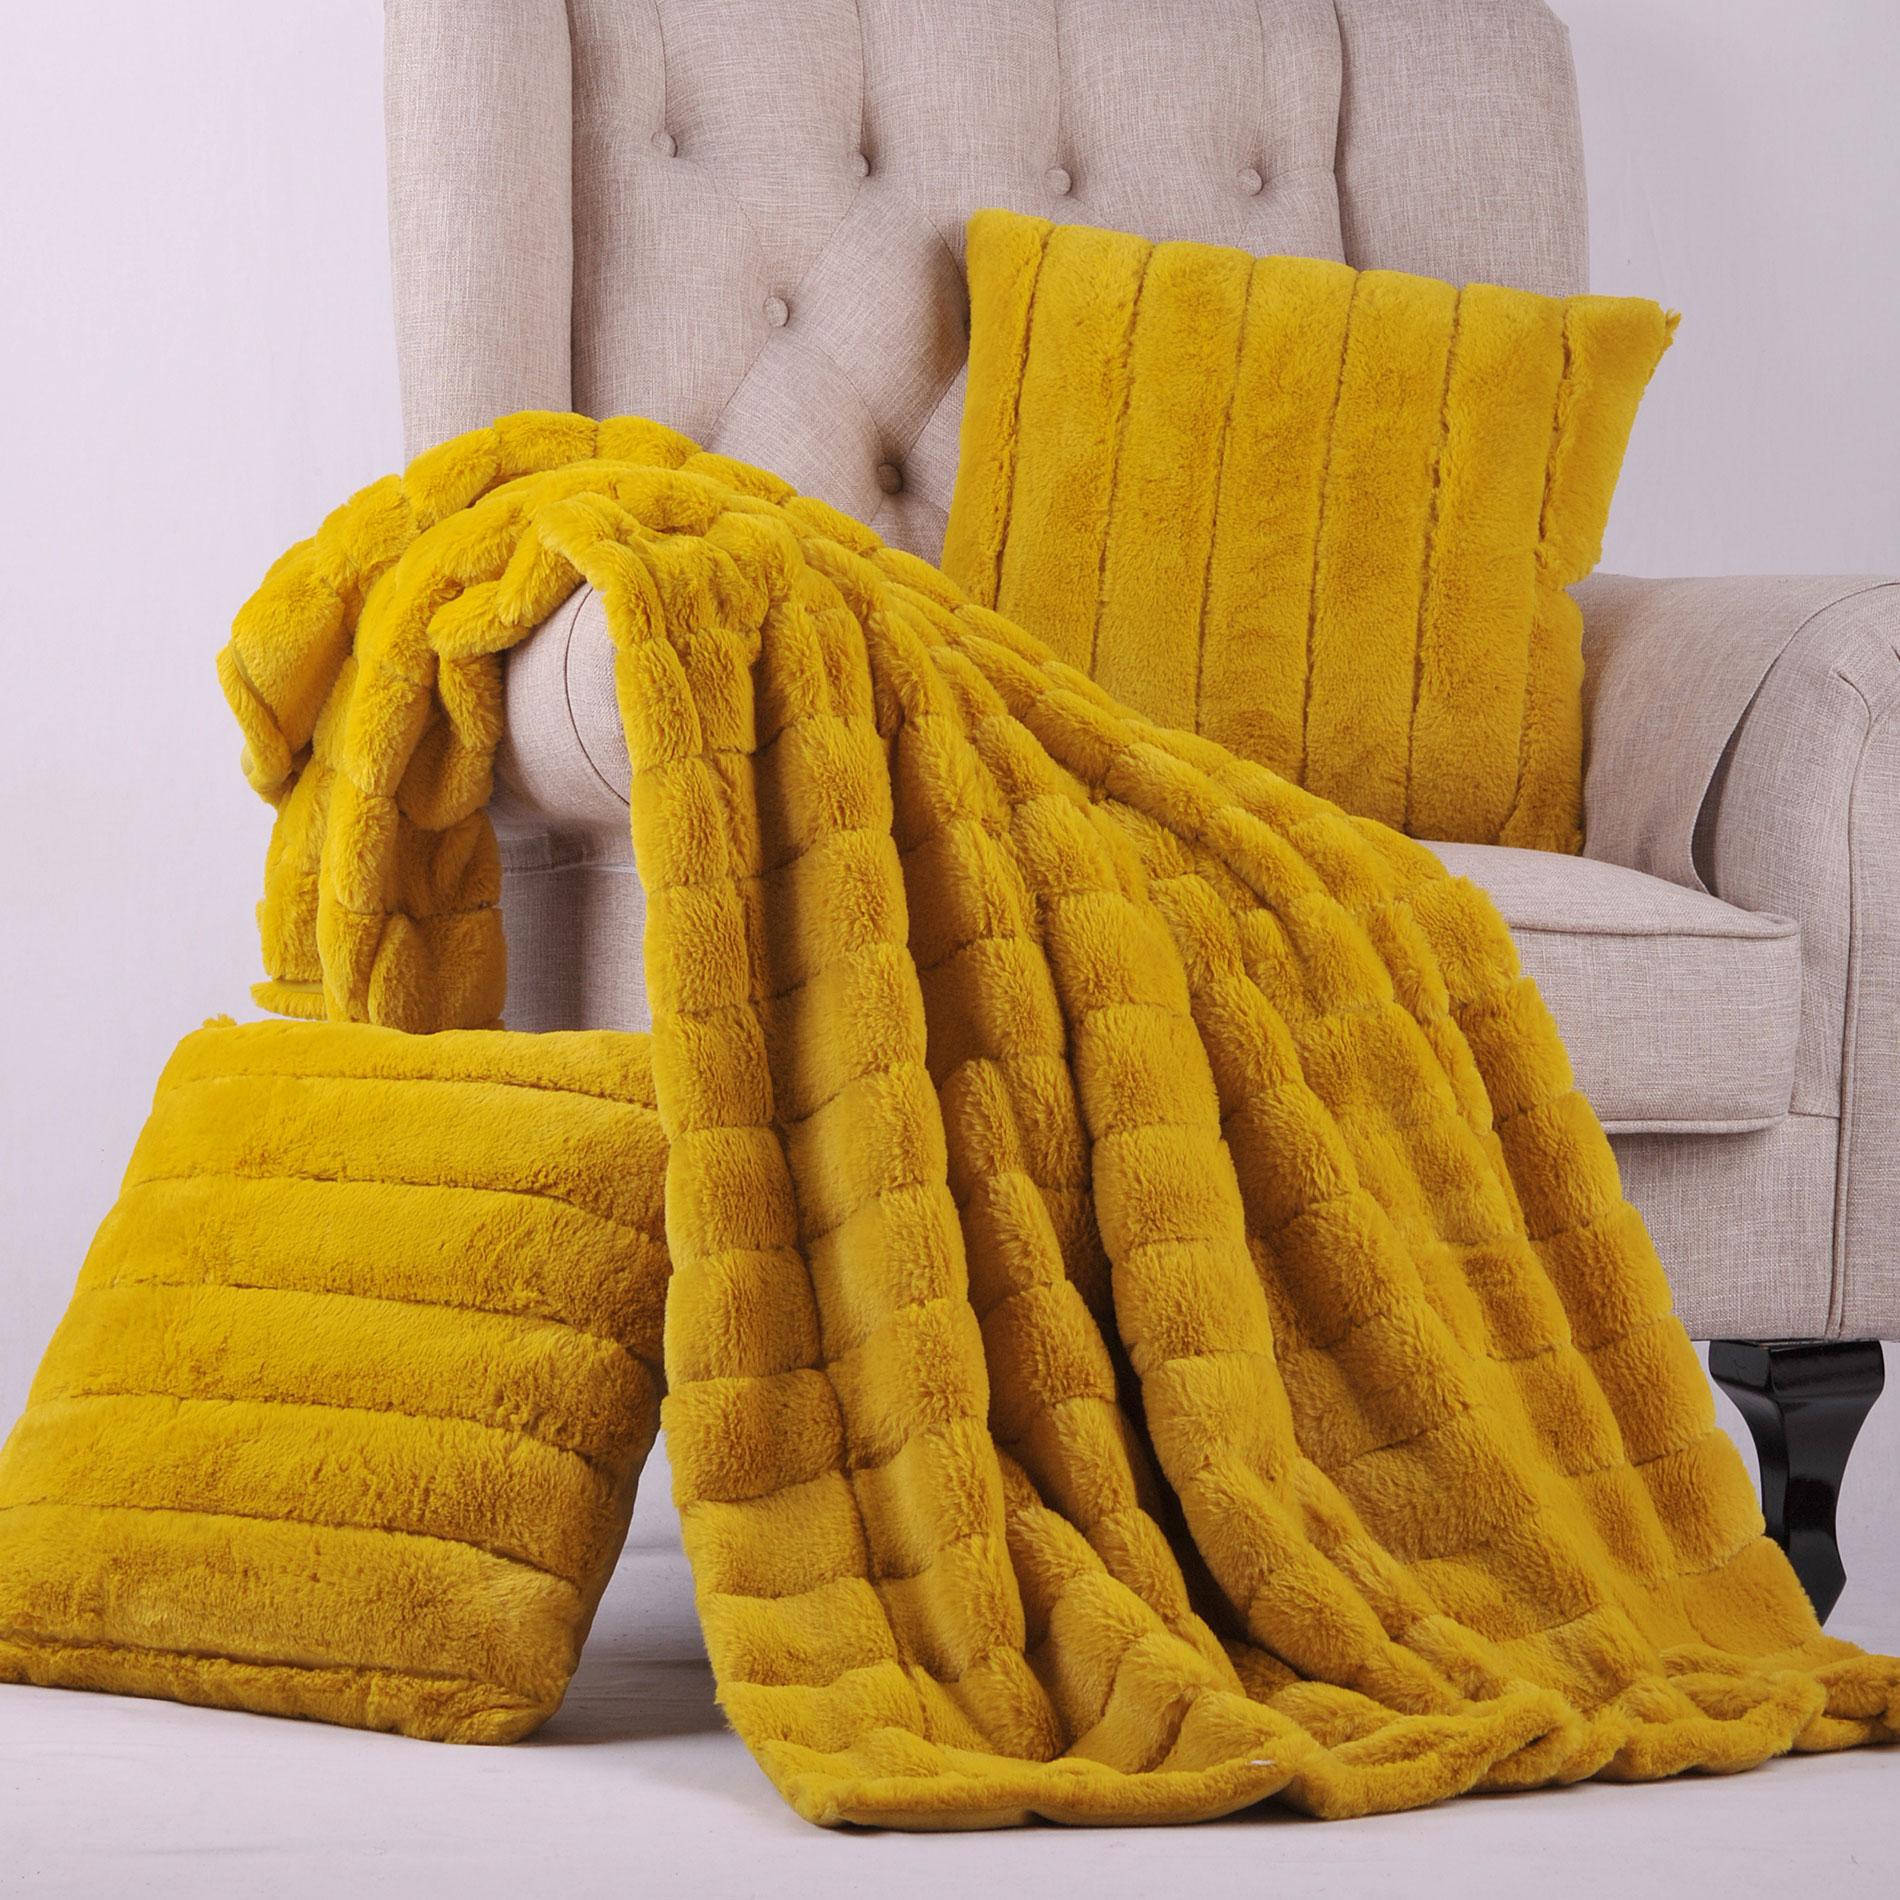 BOON Rabbit Fur Throw Blanket with 2 Pillow Combo Set